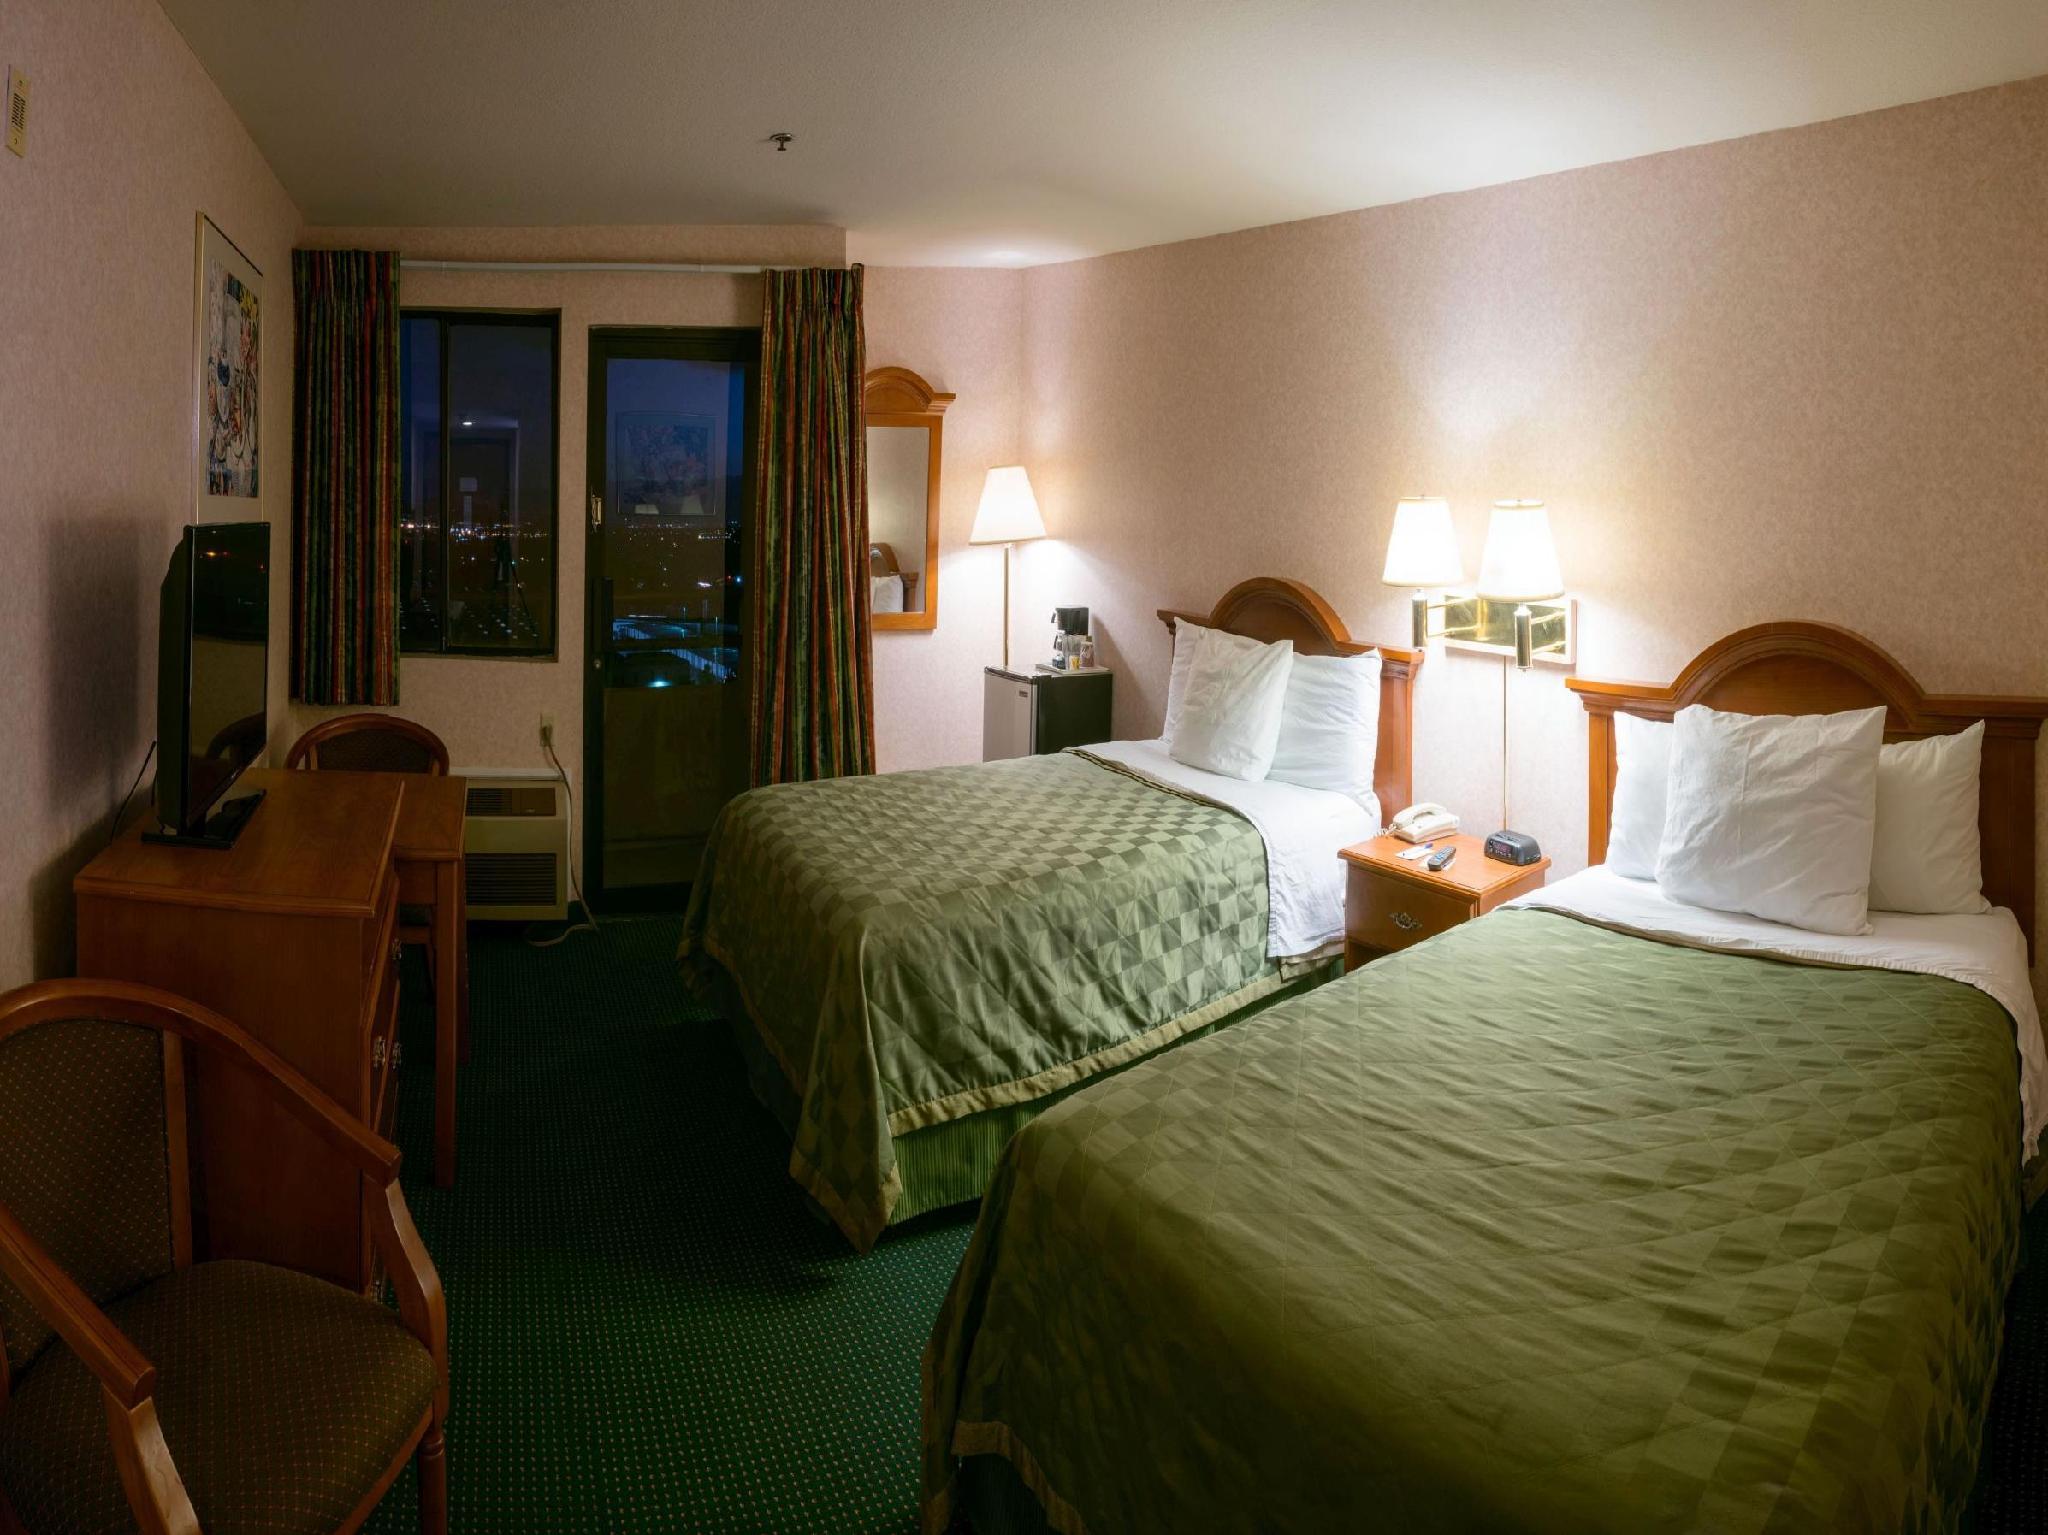 2 Double Beds Nonsmoking Hills Garden Hotel San Bernardino